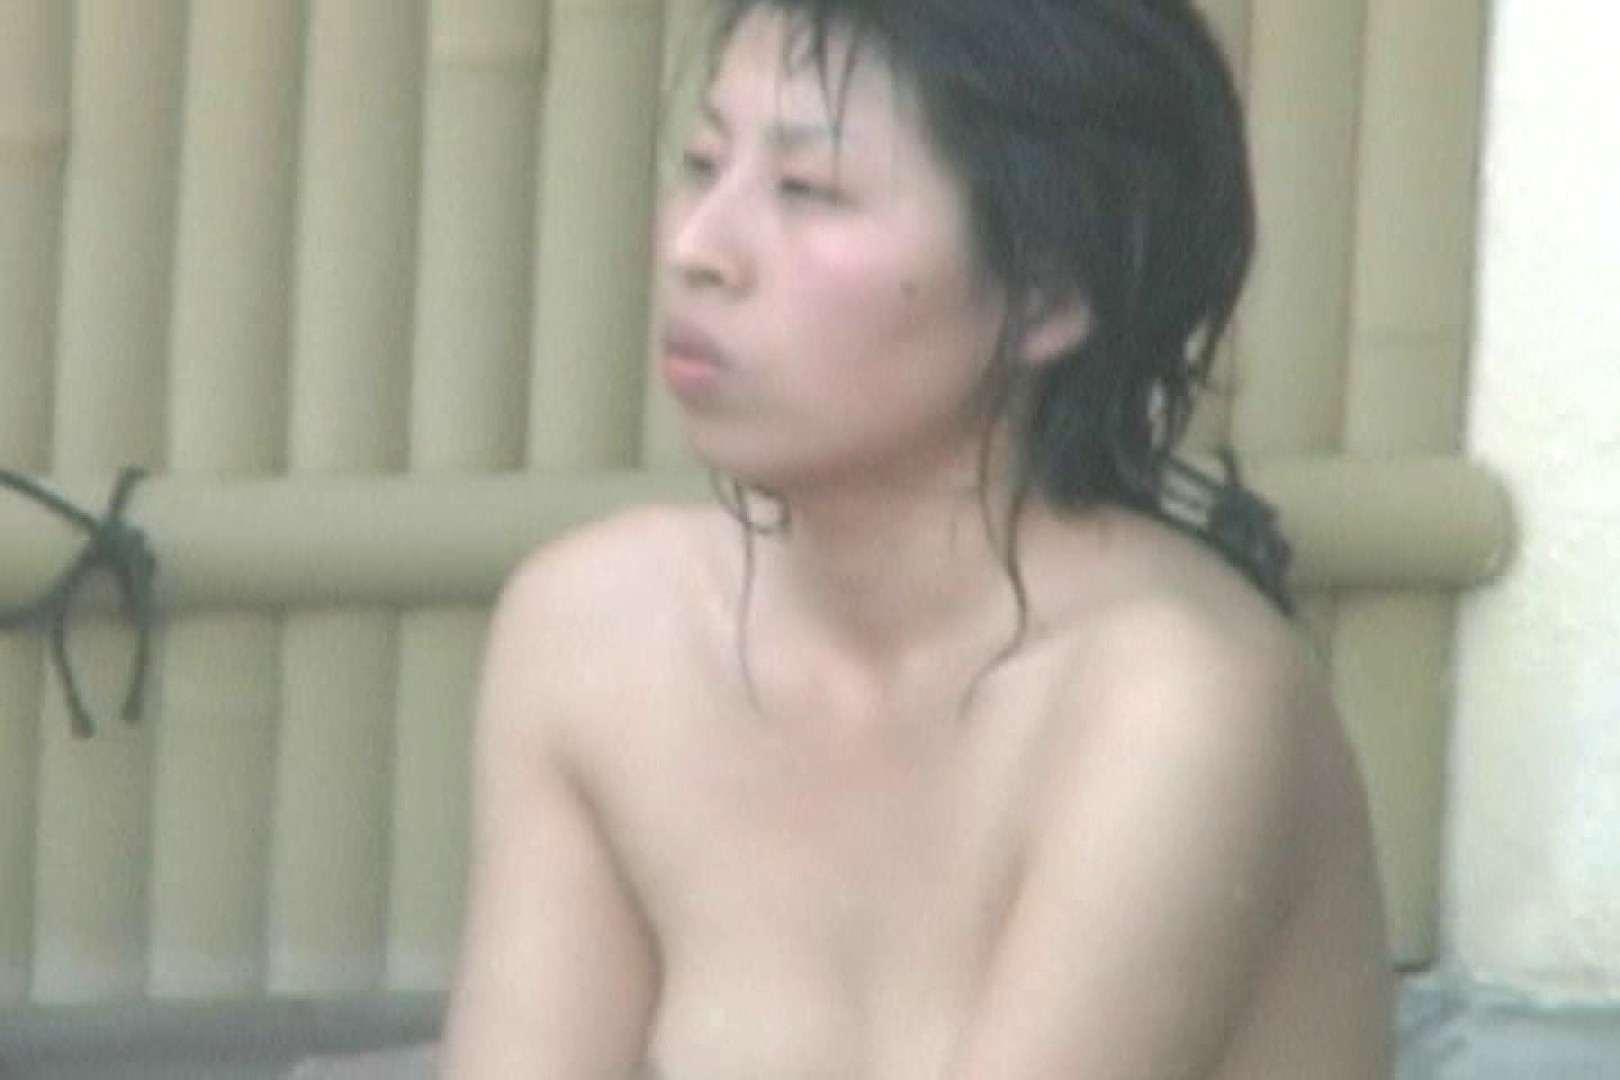 Aquaな露天風呂Vol.589 0  74連発 70